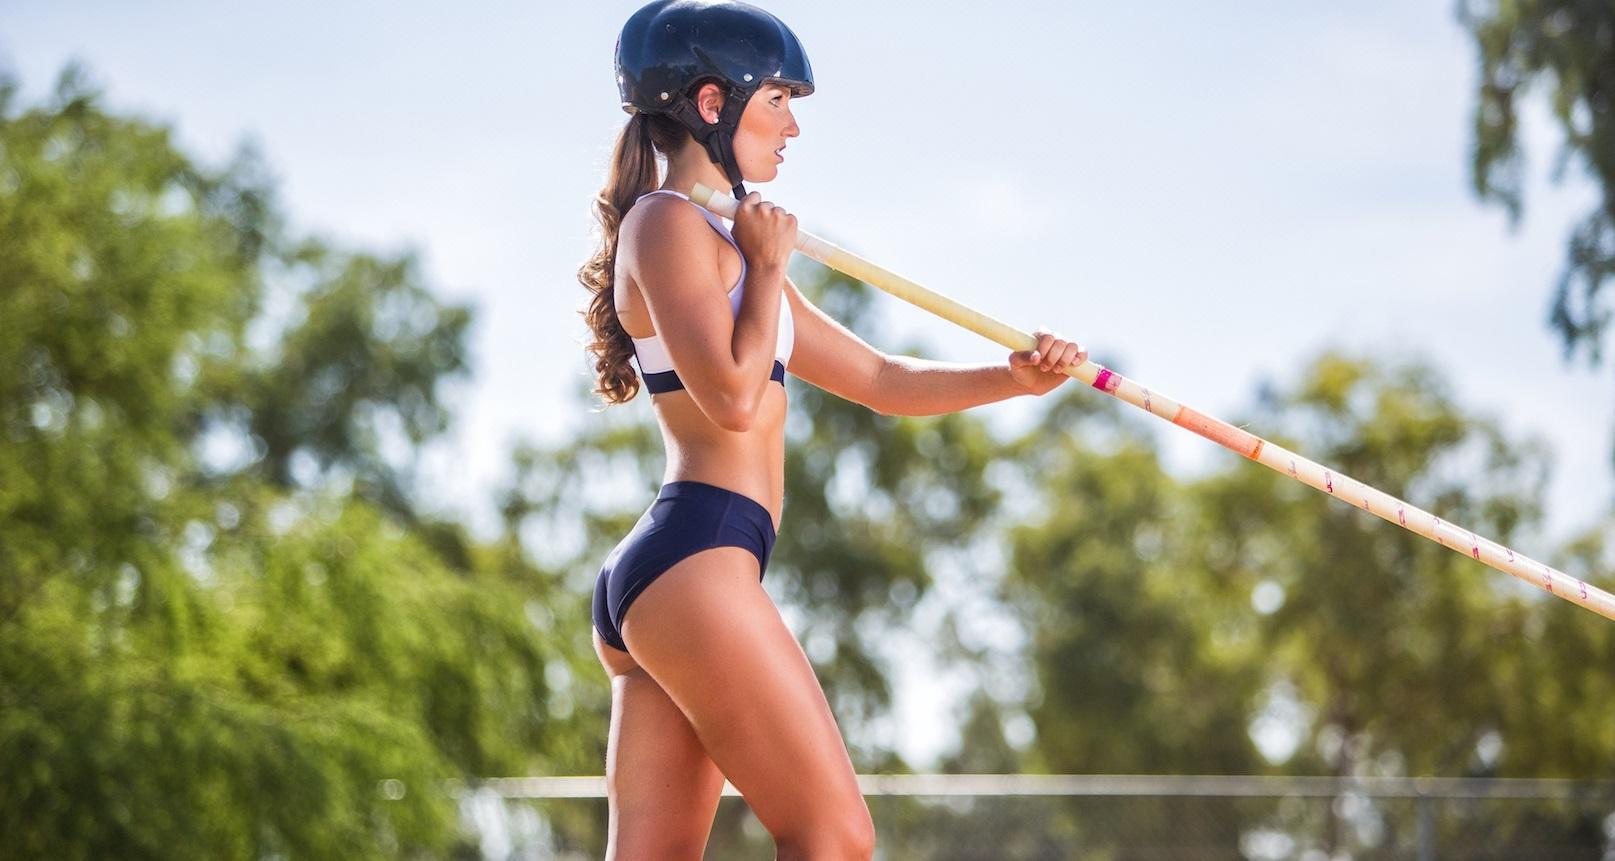 svejo.net | Секси атлетката Робин Боун